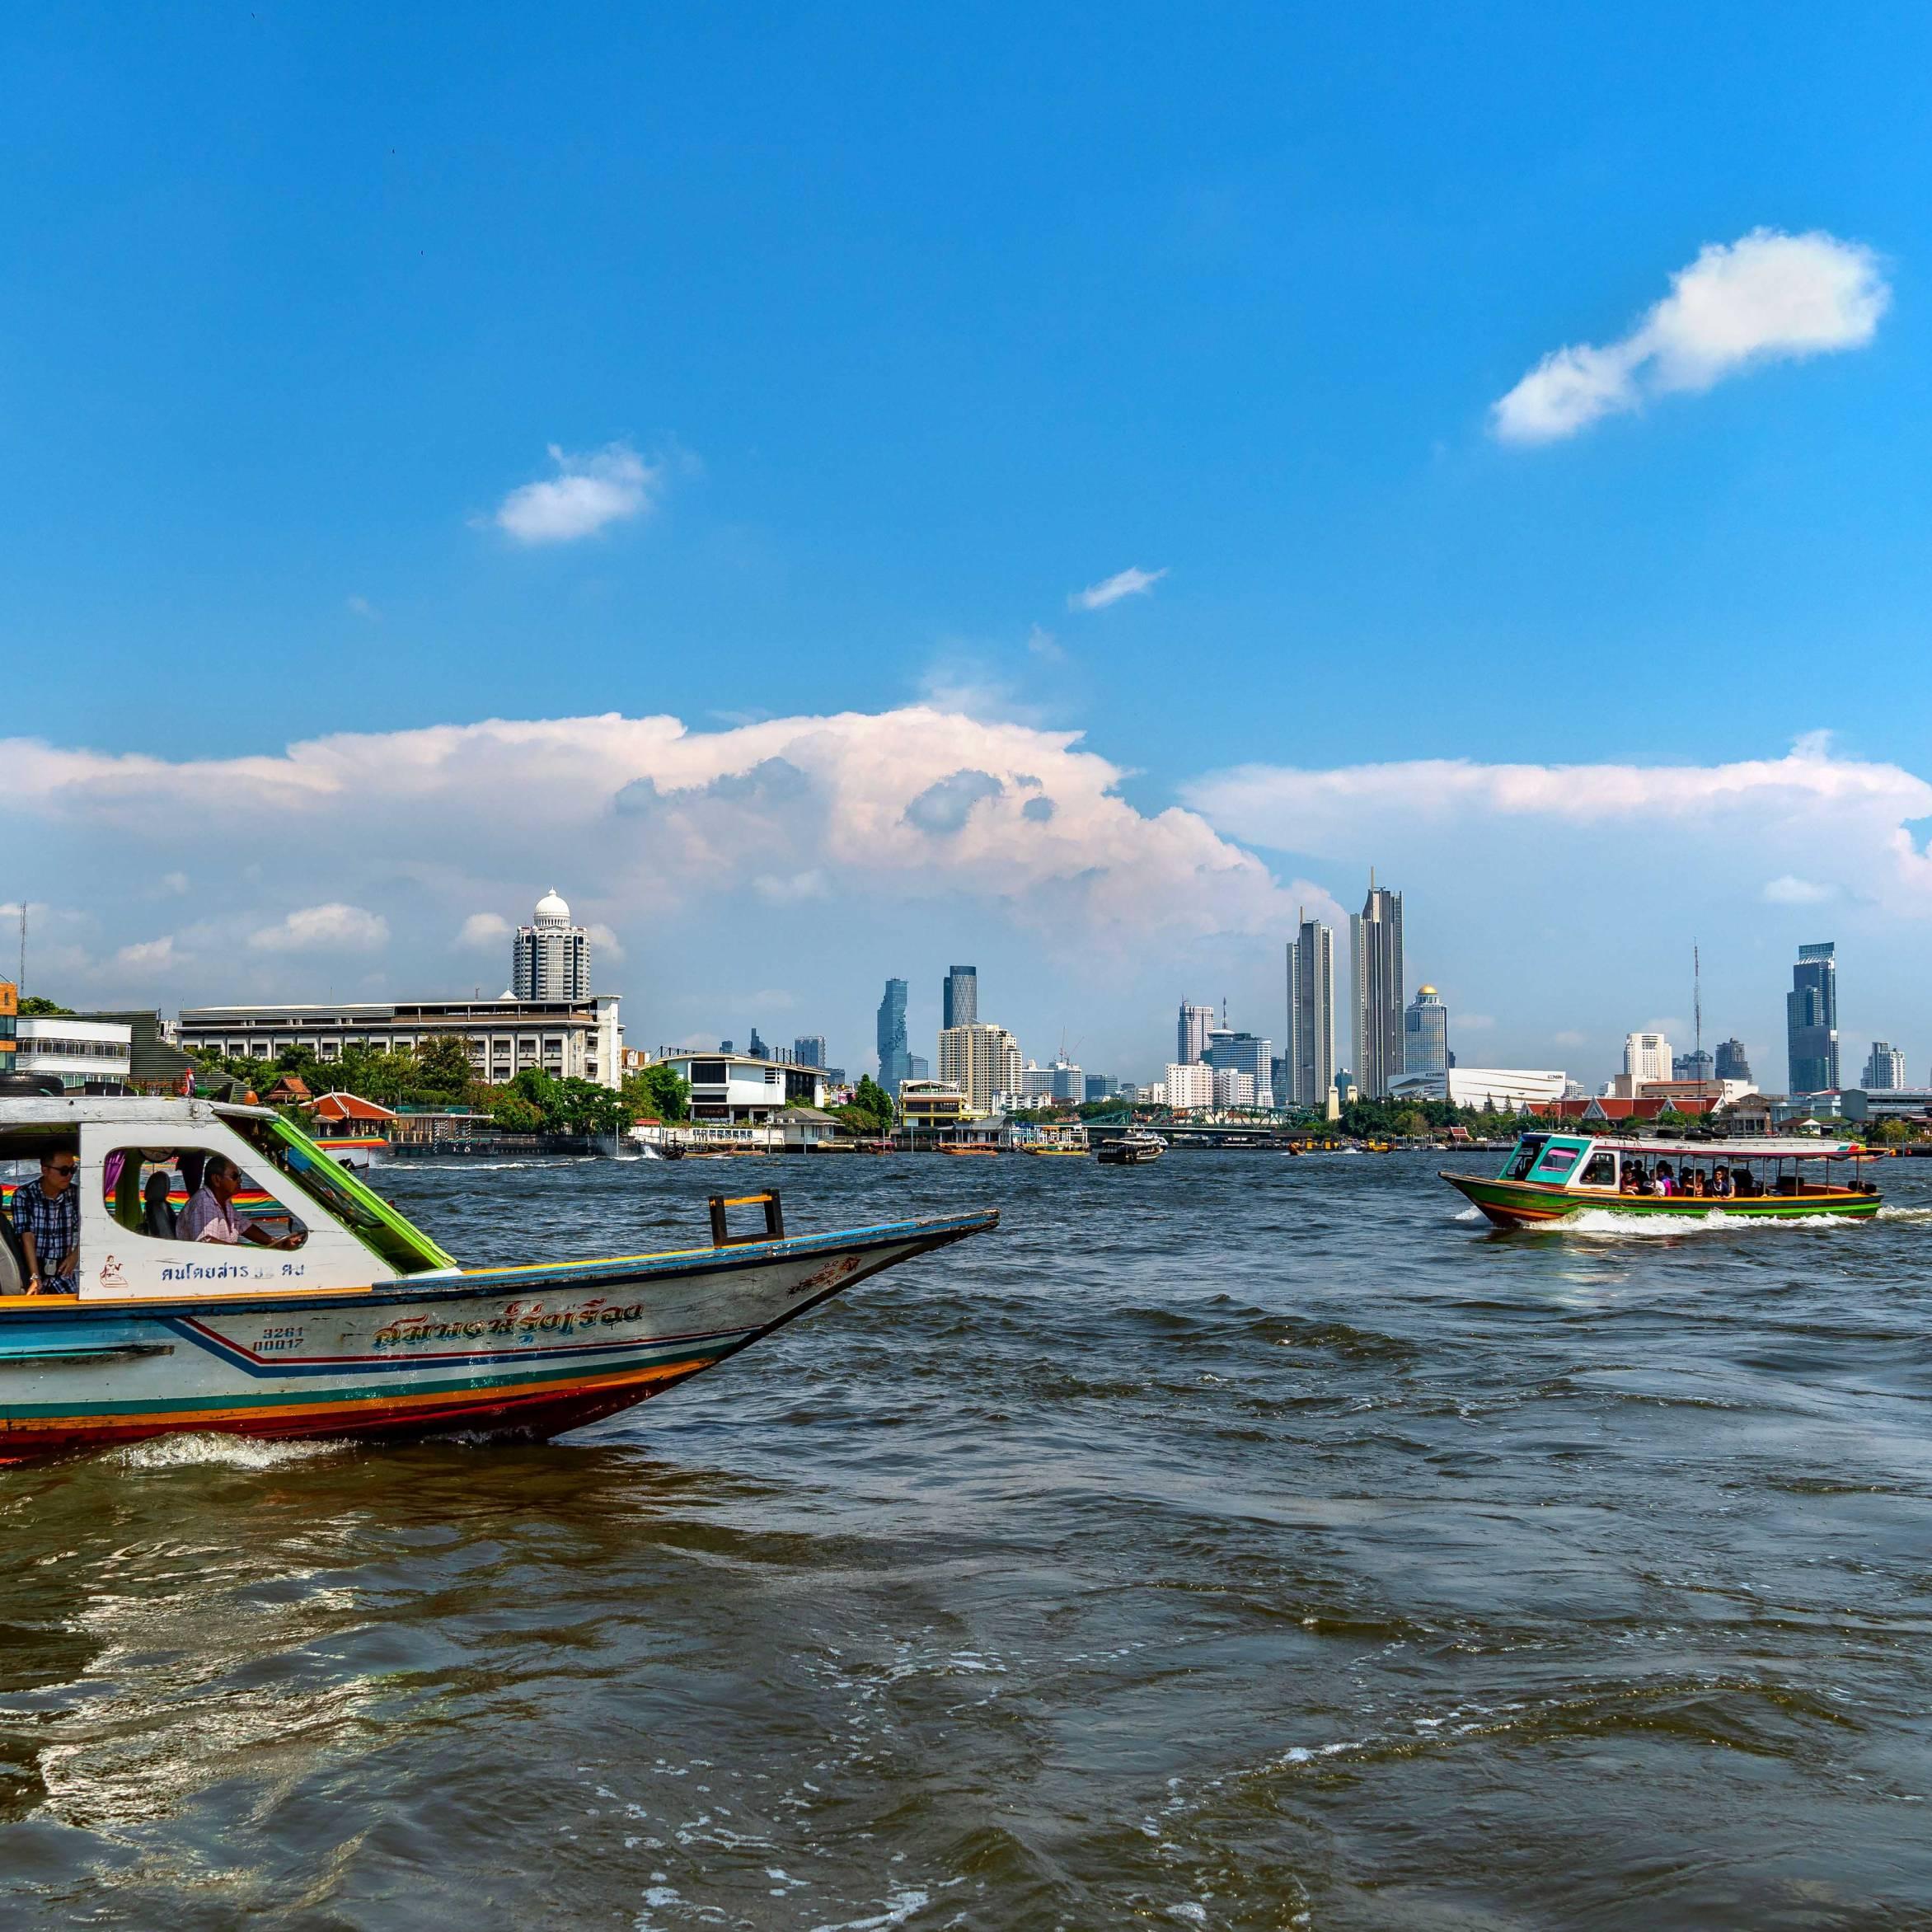 CHAO PHRAYA, BANGKOK